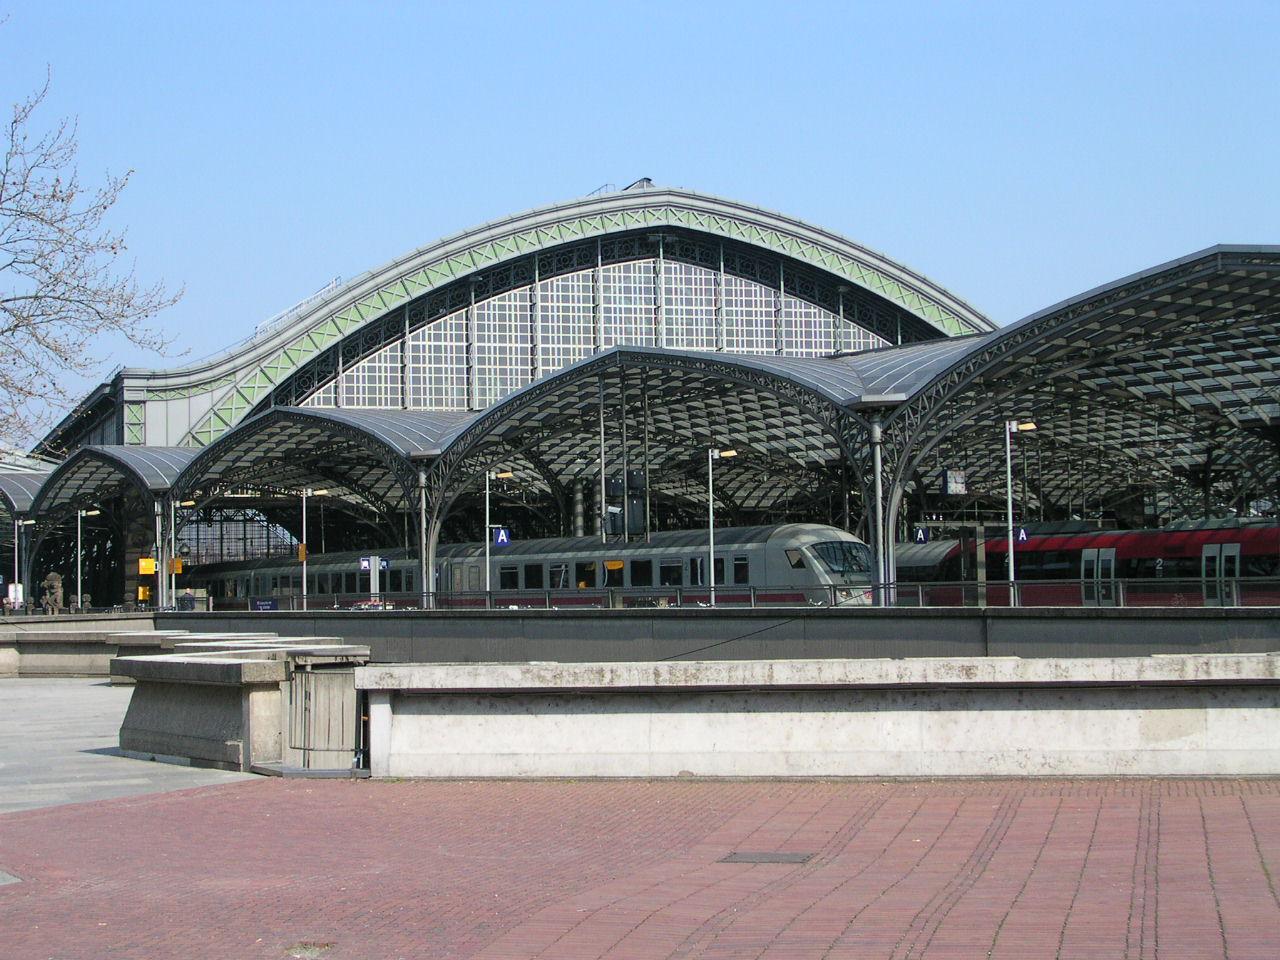 Bahnhof am Koln Germany.JPG